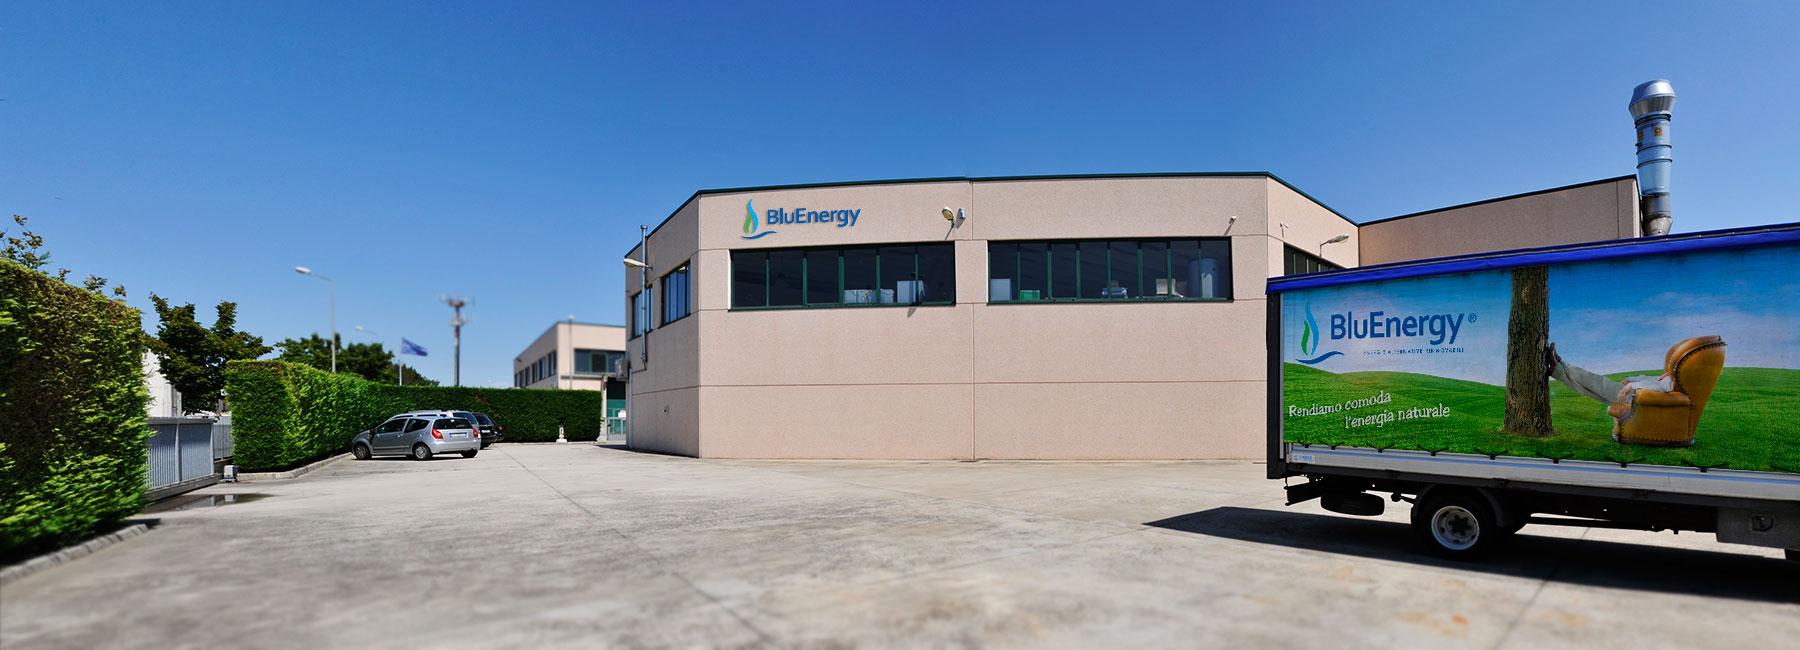 azienda-bluenergy-srl-energie-alternative-rinnovabili-padova